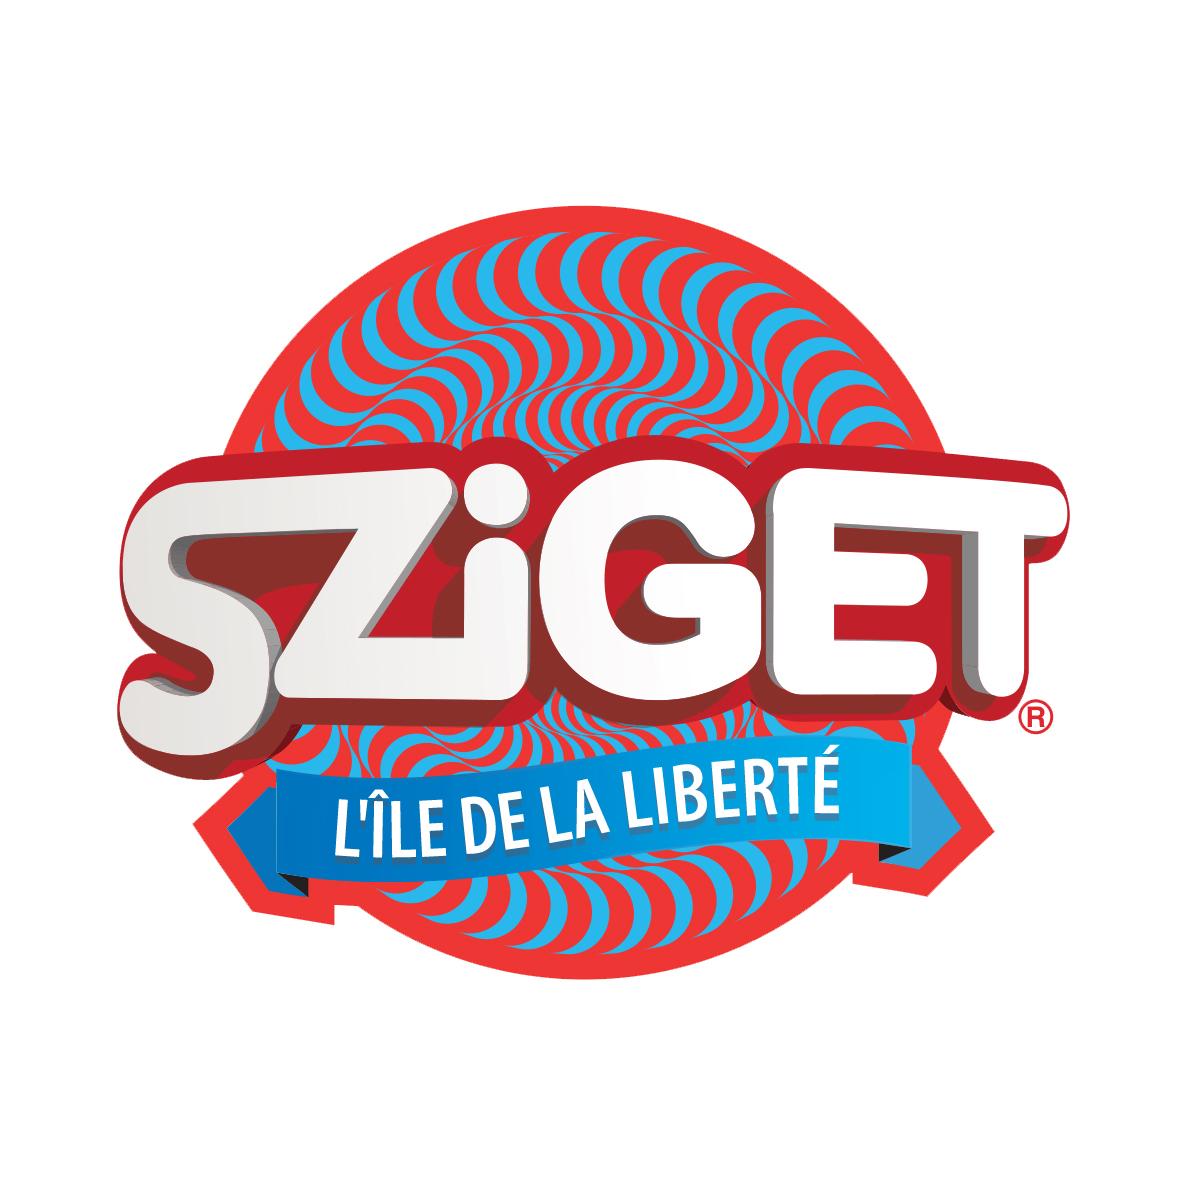 sziget_2015_logo